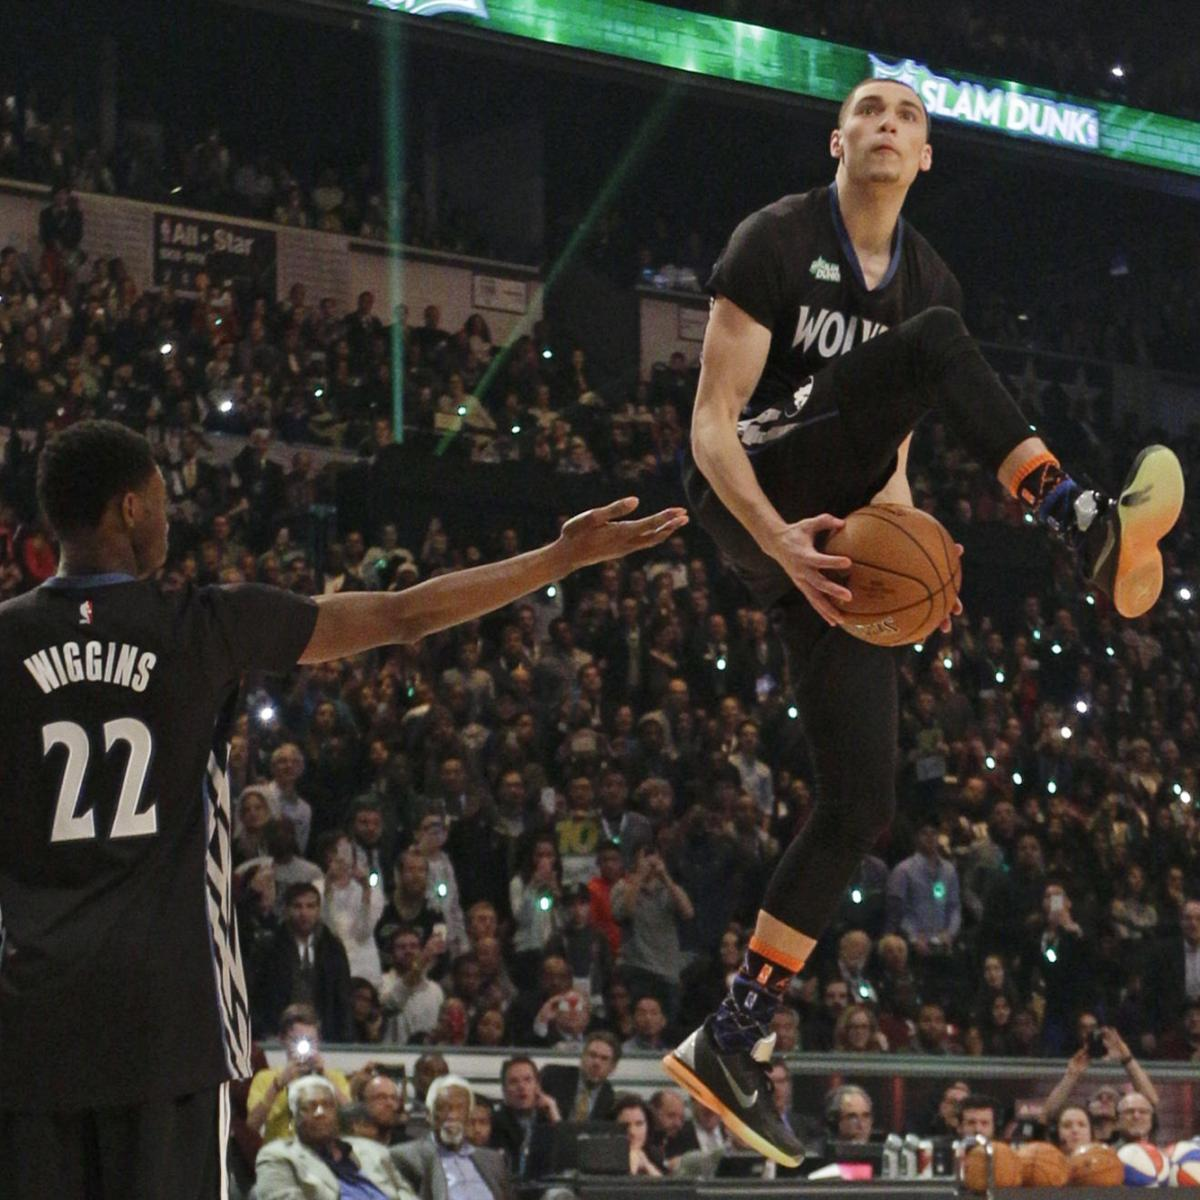 Zach LaVine Wins 2015 NBA Slam Dunk Contest: Scores